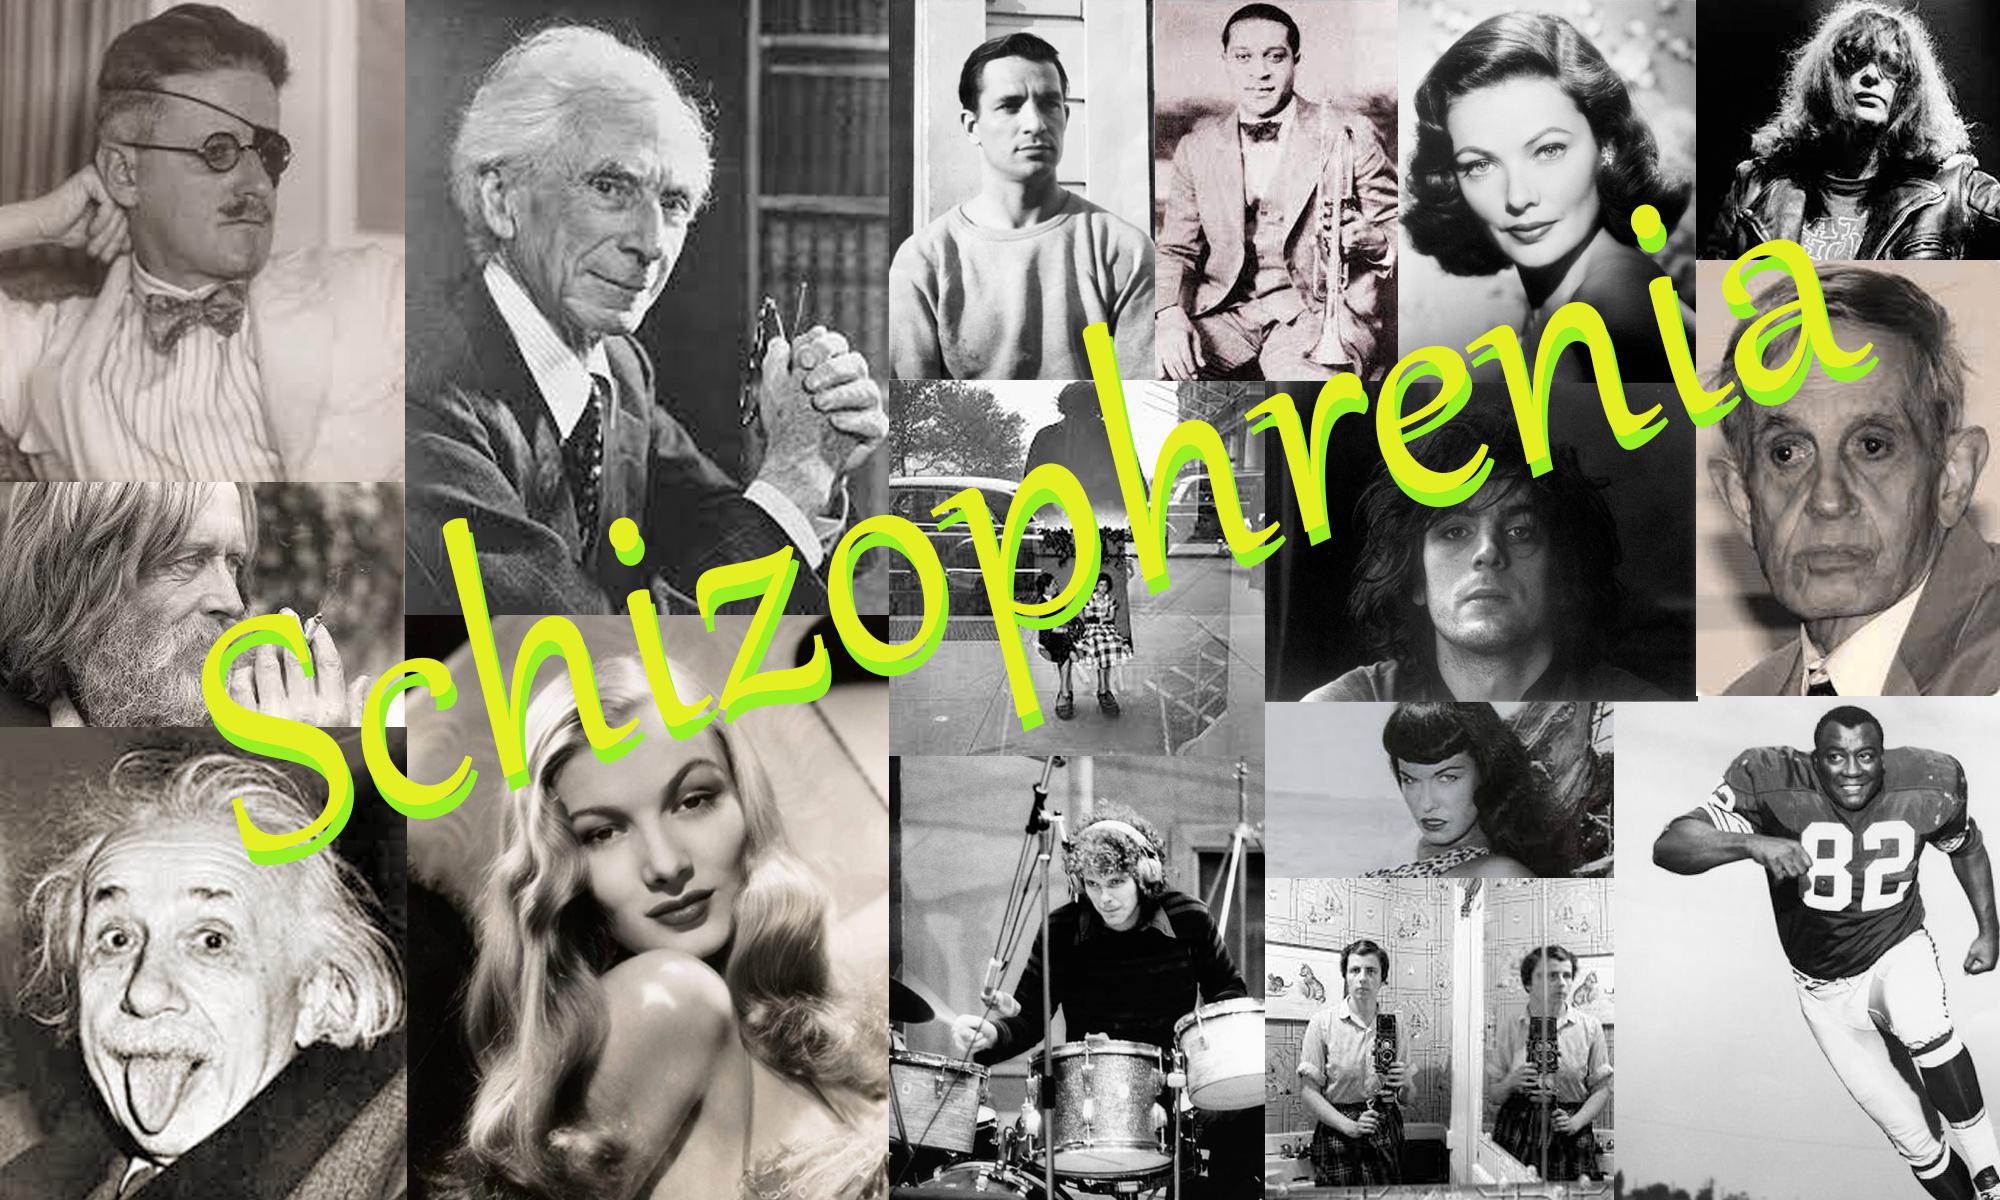 Famous people with schizophrenia include Lionel Aldridge, Syd Barrett, Joey Ramone, Vivian Maier, Gene Tierney, Bettie Page, John Nash